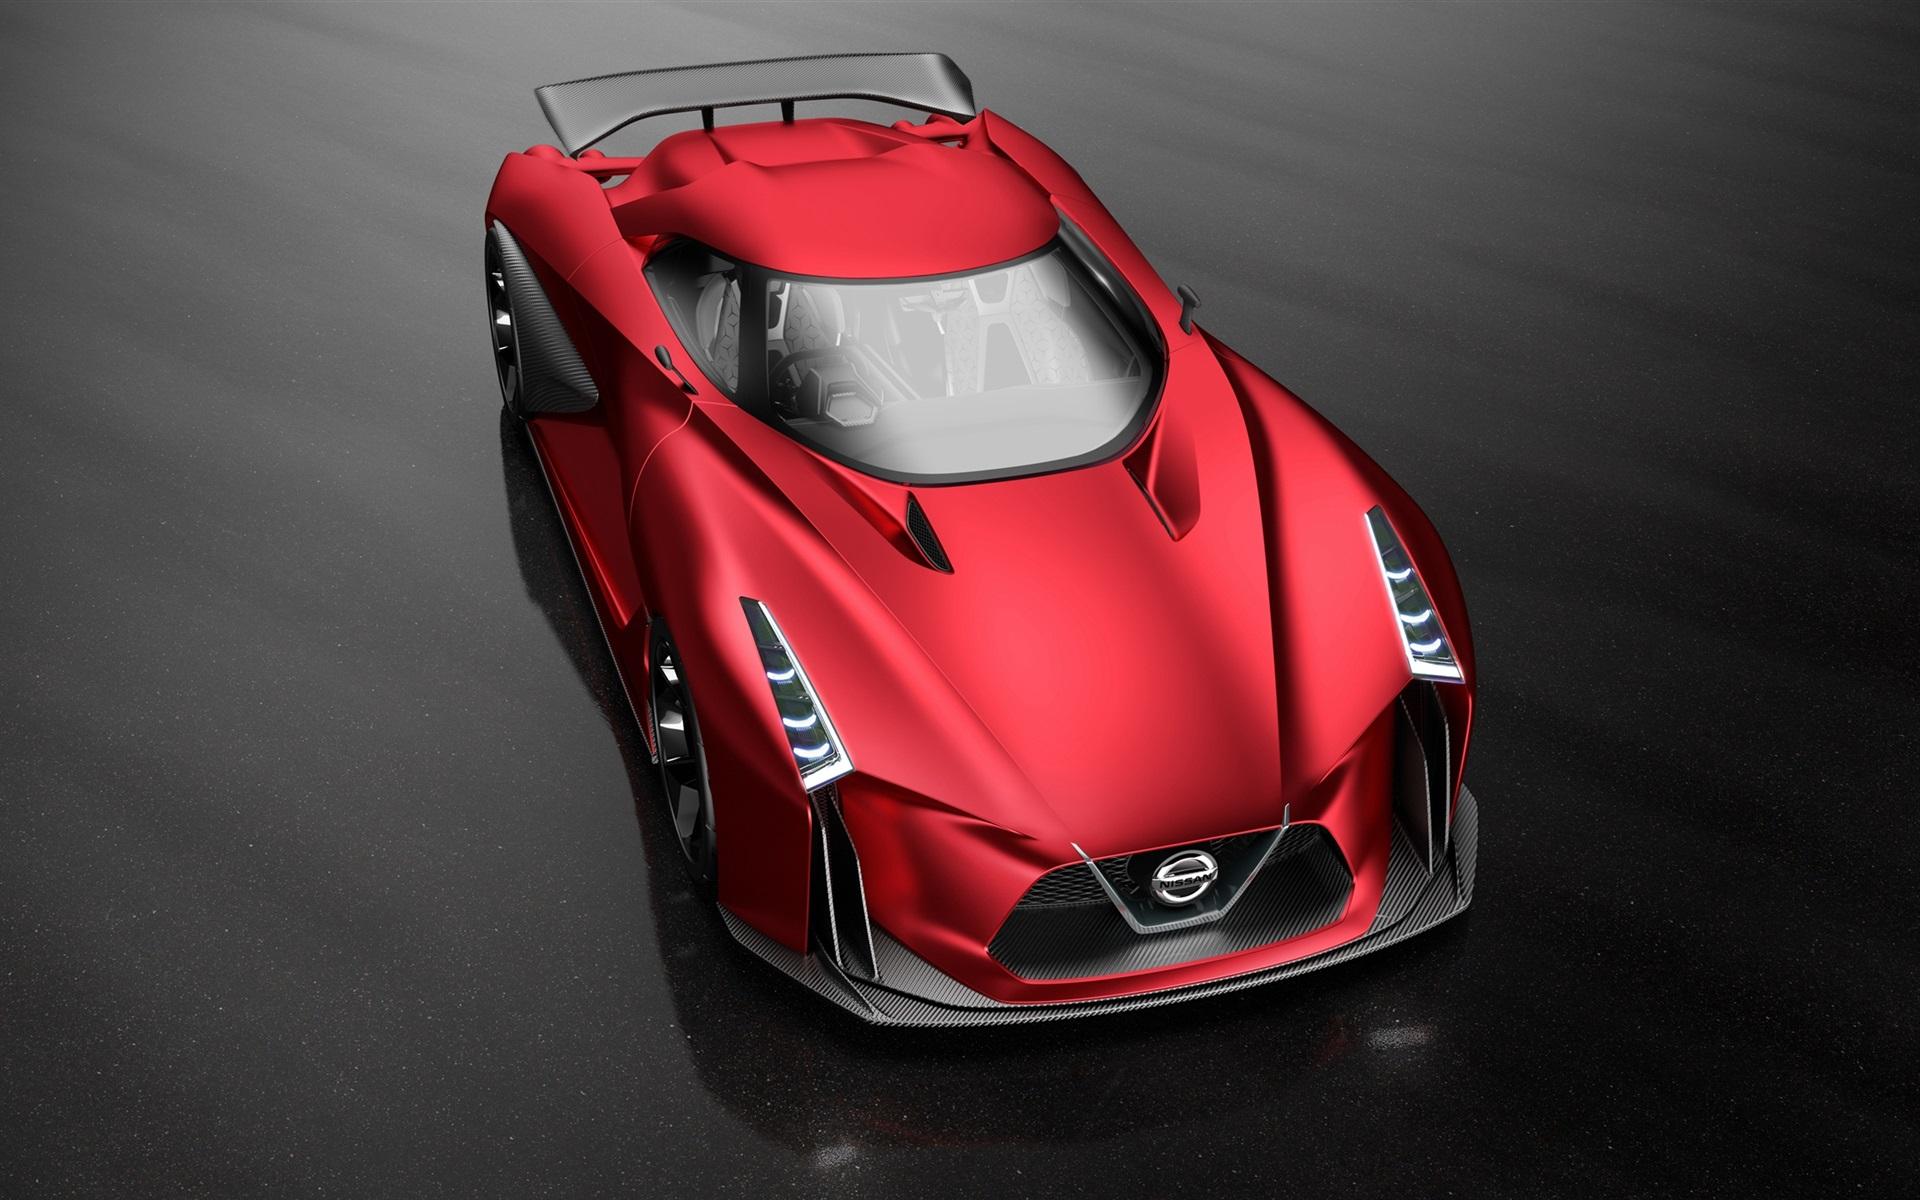 Front Nissan Maxima 2015 Hd Wallpaper Iphone 6 Wallpaper: Wallpaper 2015 Nissan Concept 2020 Vision Gran Turismo